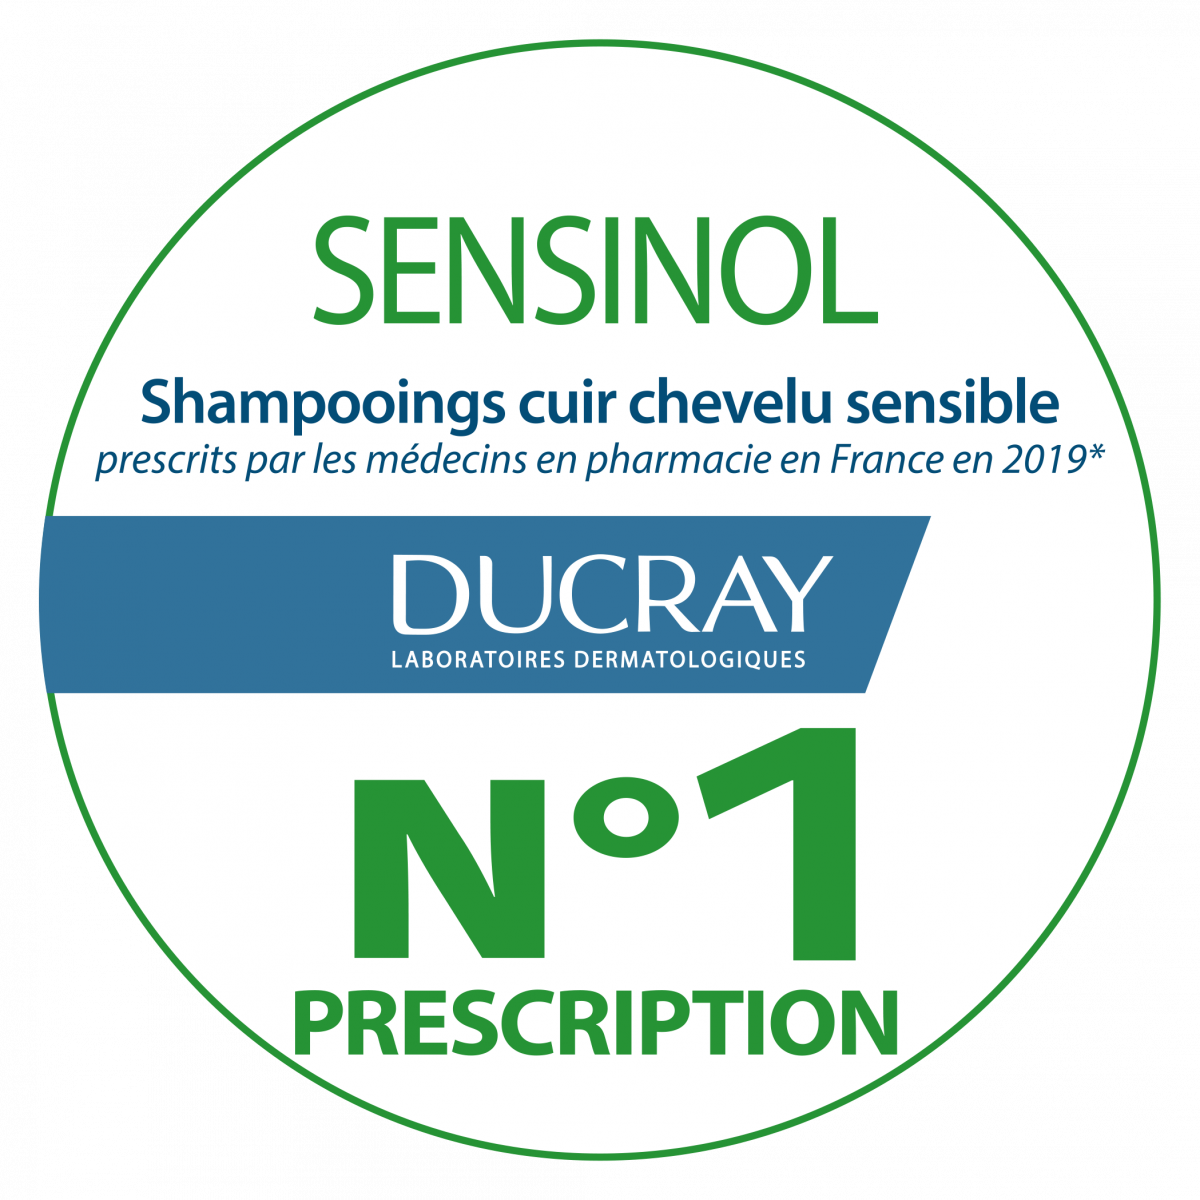 sensinol_shampoo_logo_n1_prescription_f_2020